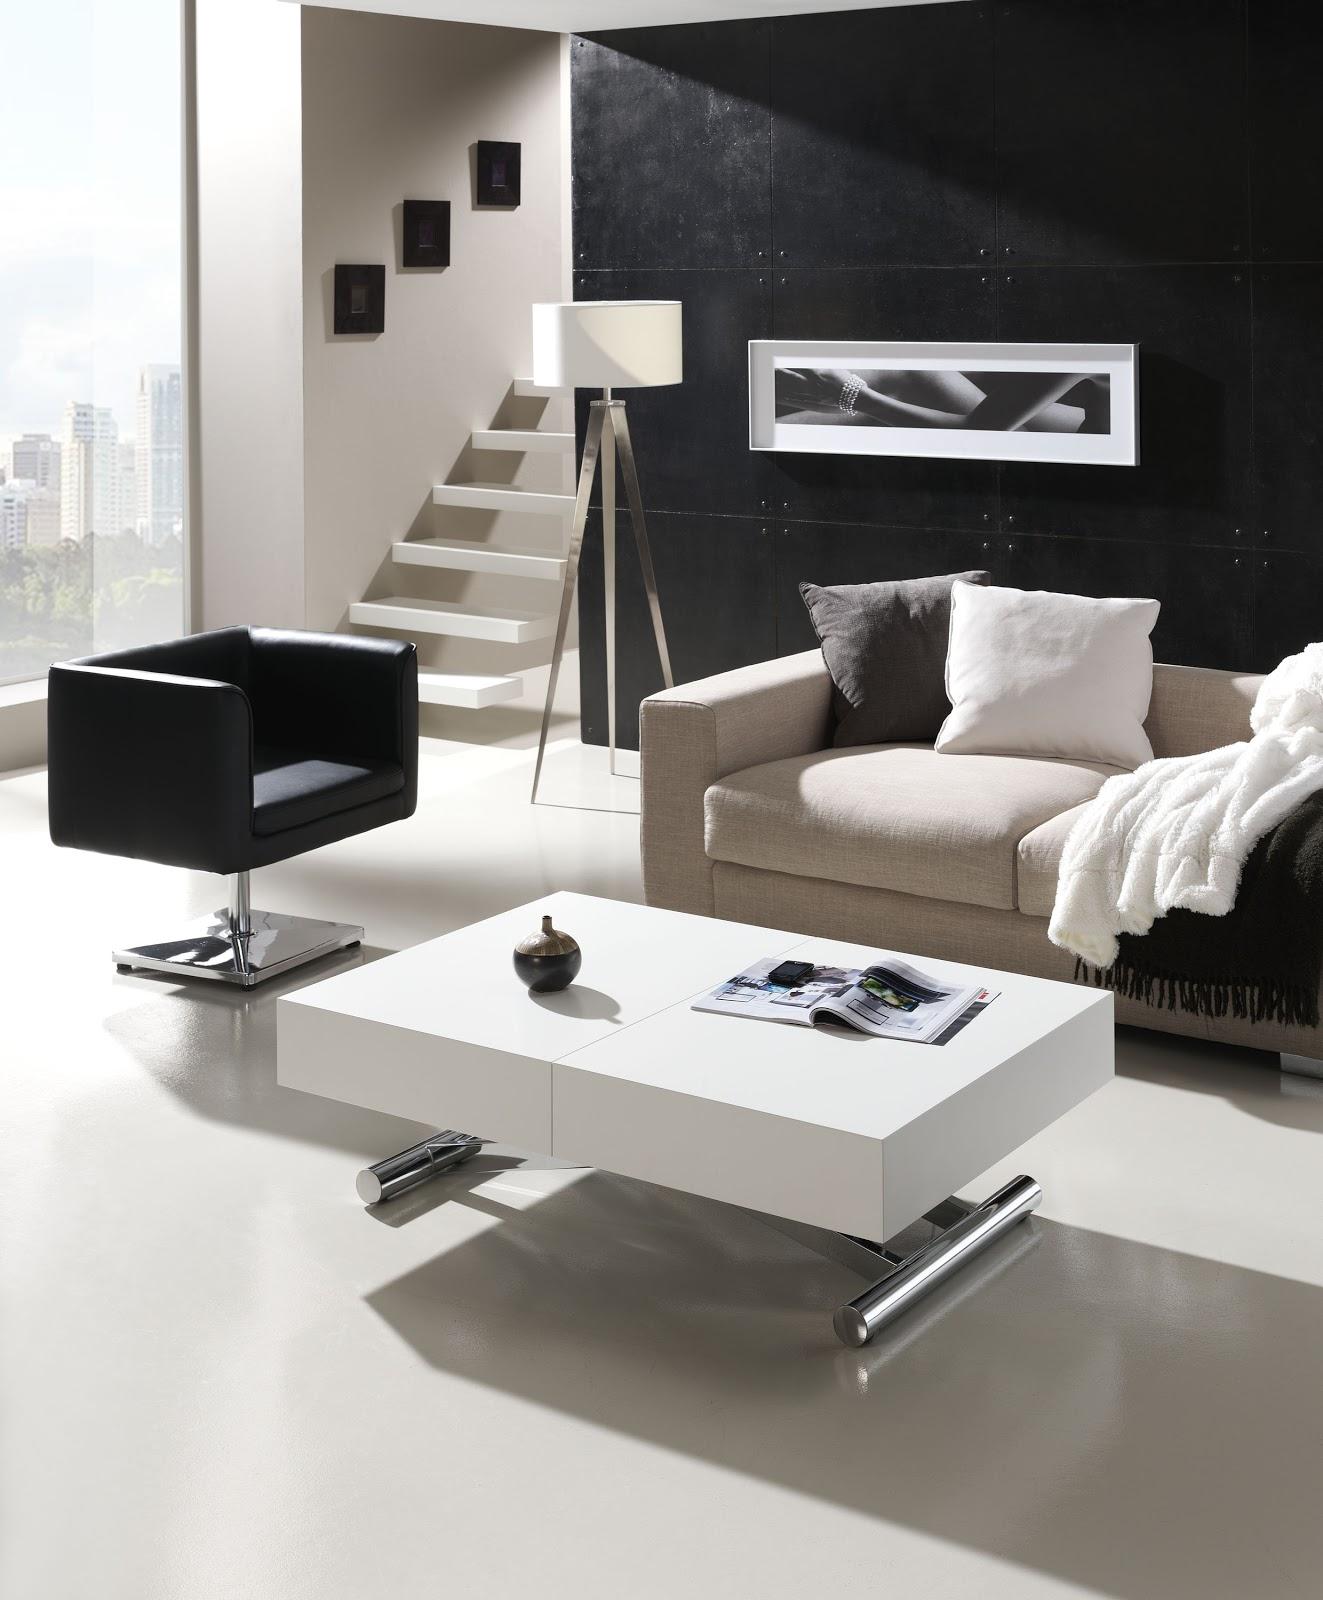 Comedores Ikea Pequeños | Liatorp Henriksdal Mesa Con 4 Sillas Ikea ...